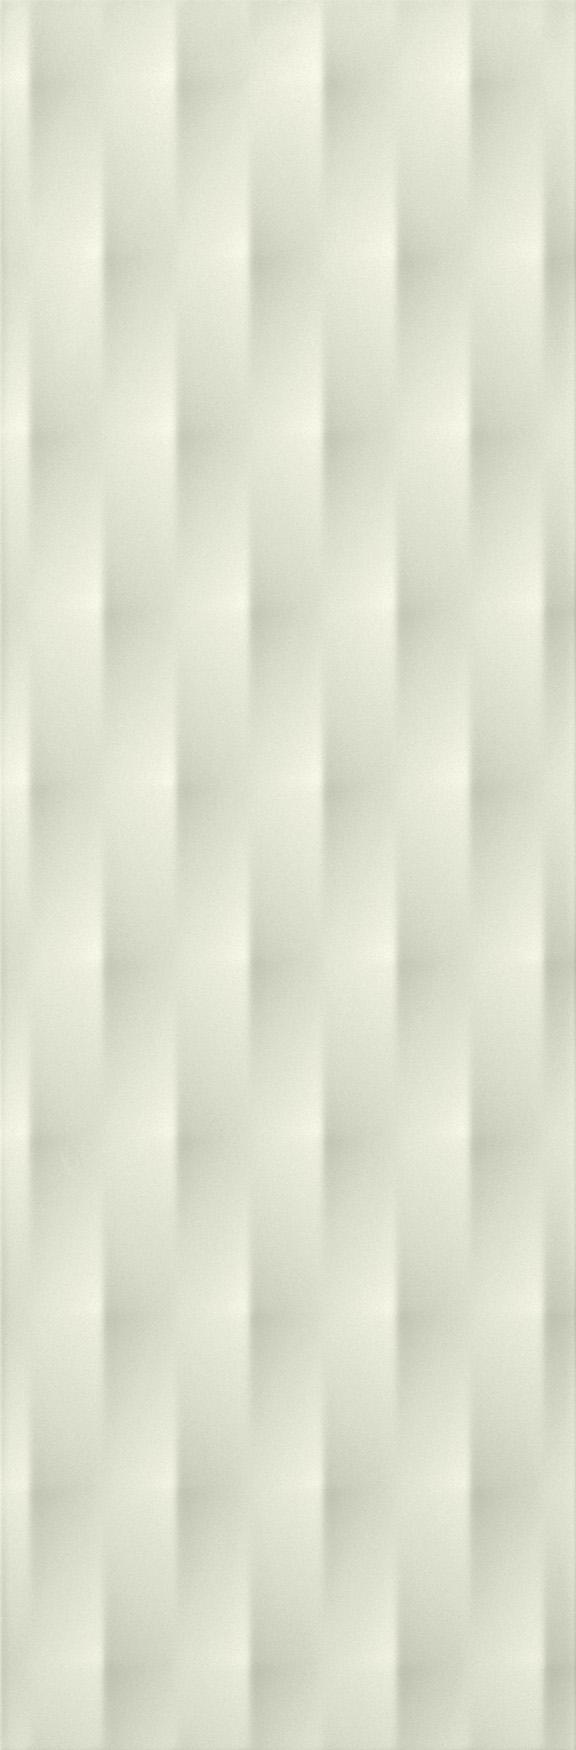 Настенная плитка FAP Ceramiche Lumina +23865 Diamante Beige Matt цена